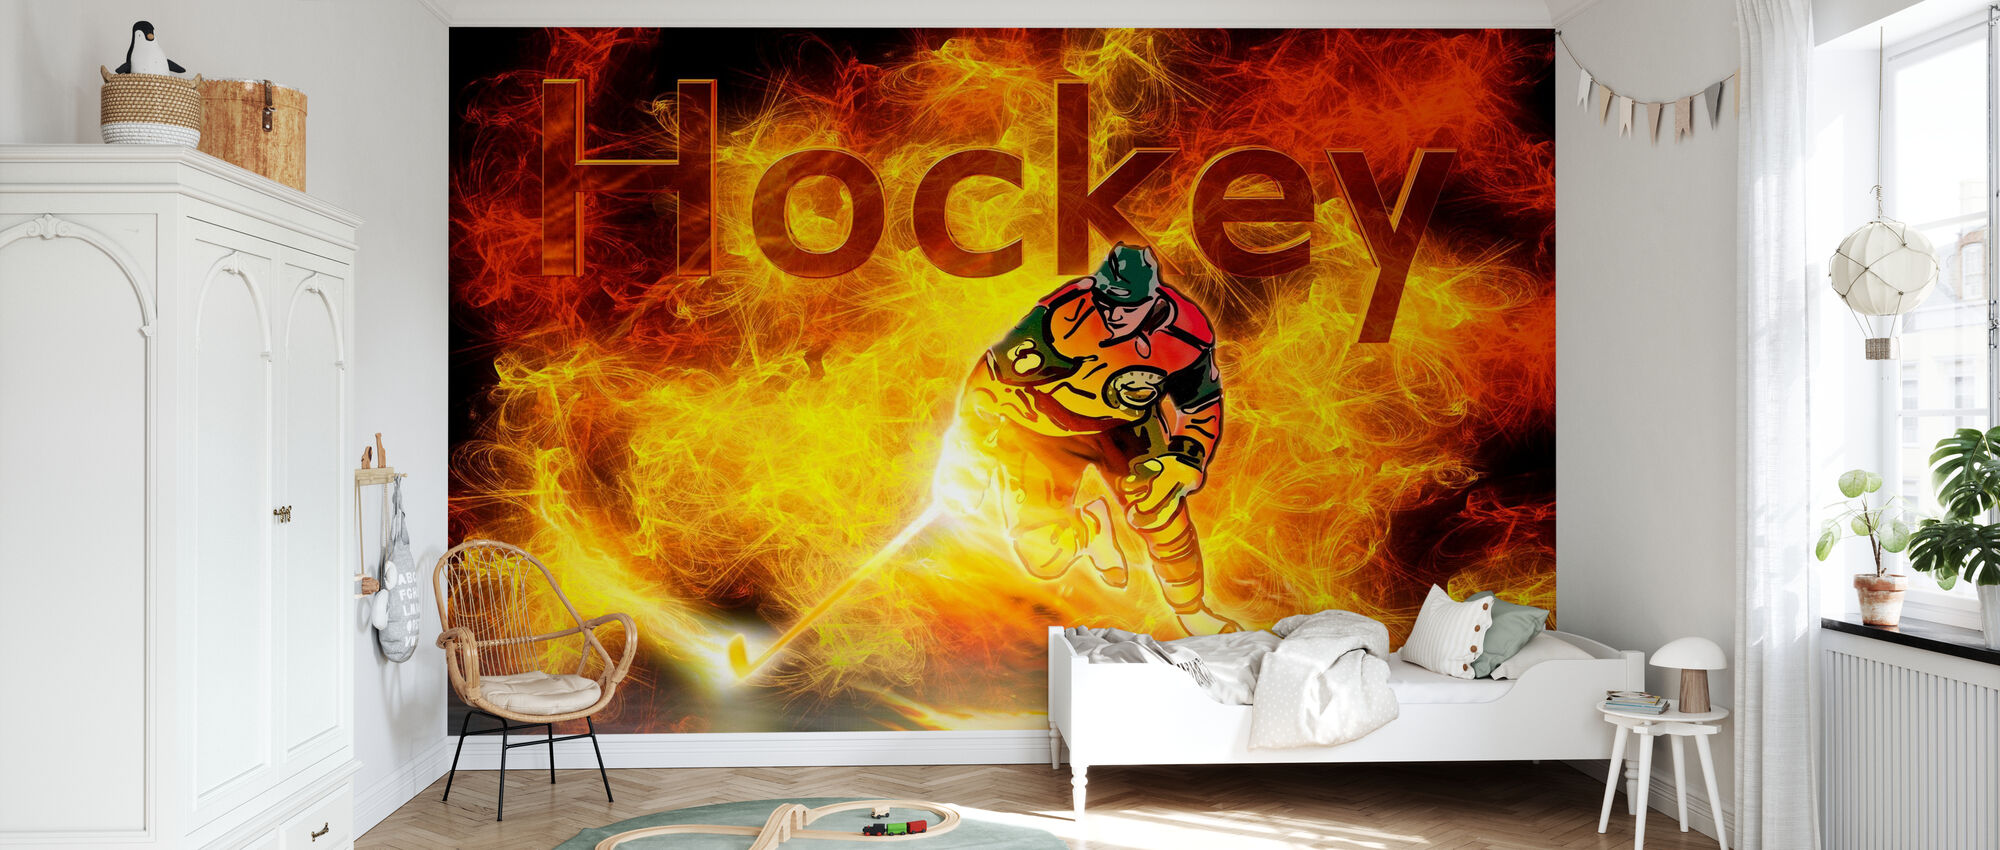 Hockey Heat - Tapet - Barnerom